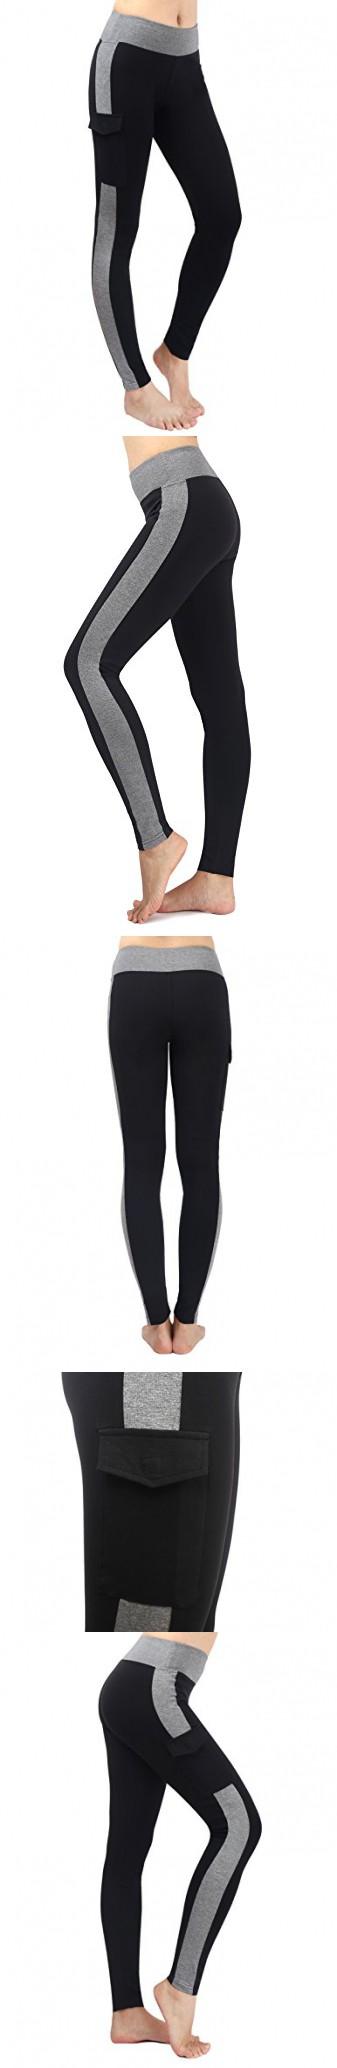 Neonysweets Womens Yoga Pants Tights Running Fitness Pants Leggings Black Gray S